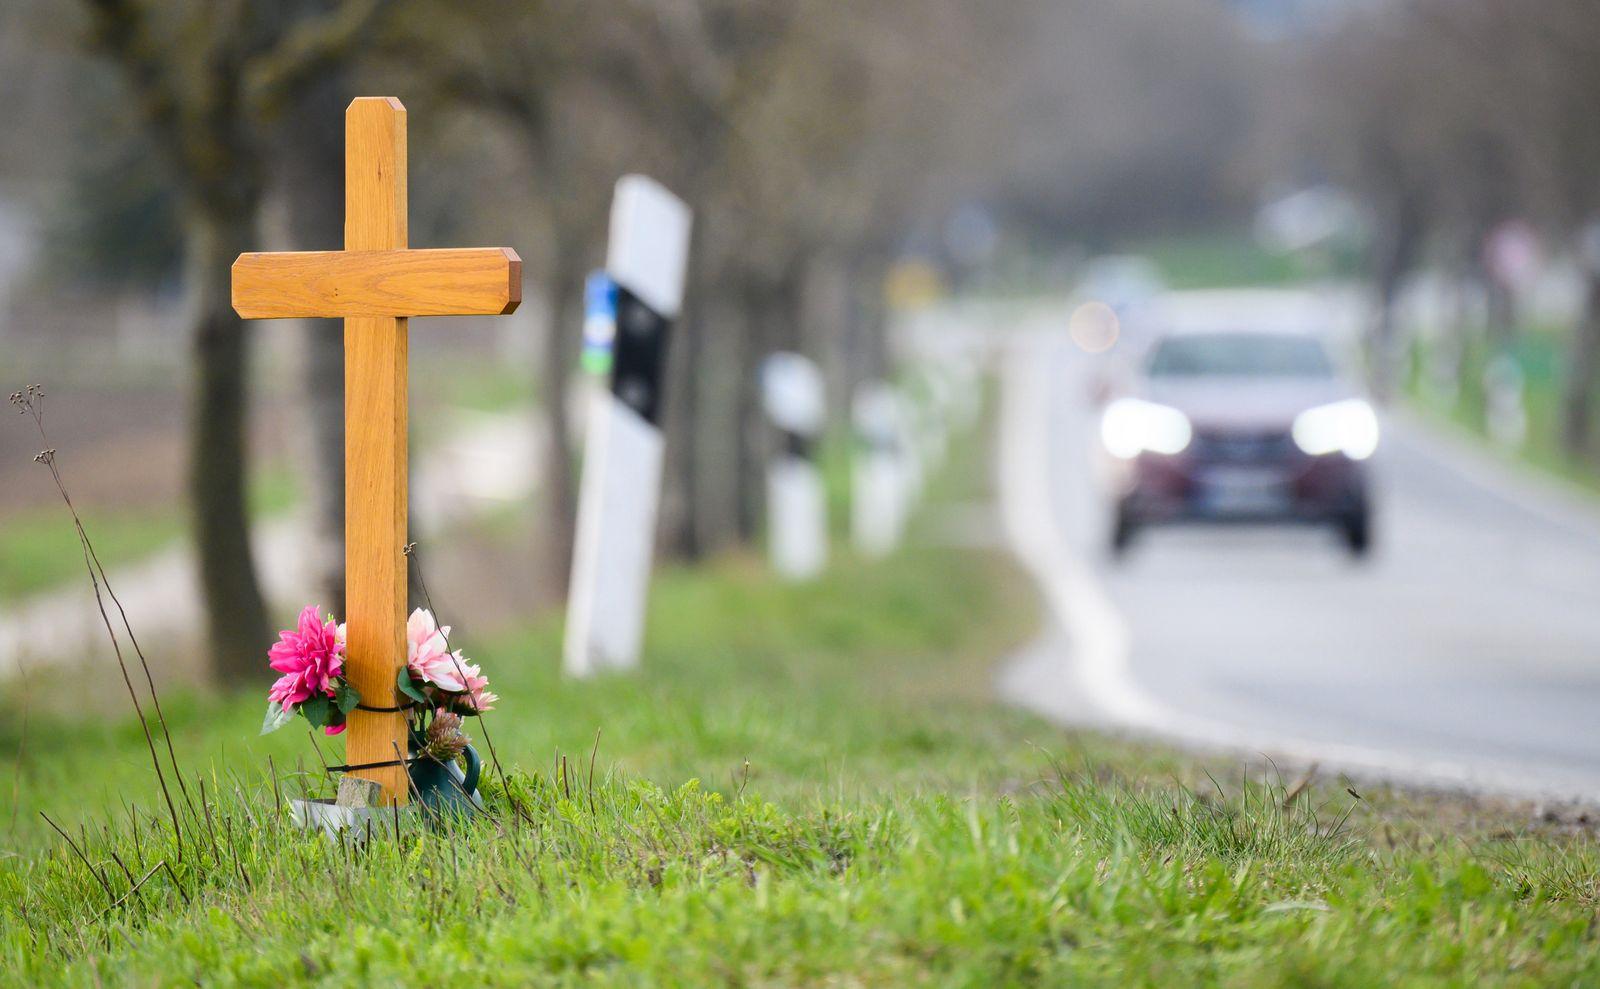 Zahl der Verkehrstoten inEuropa 2020 «drastisch» gesunken